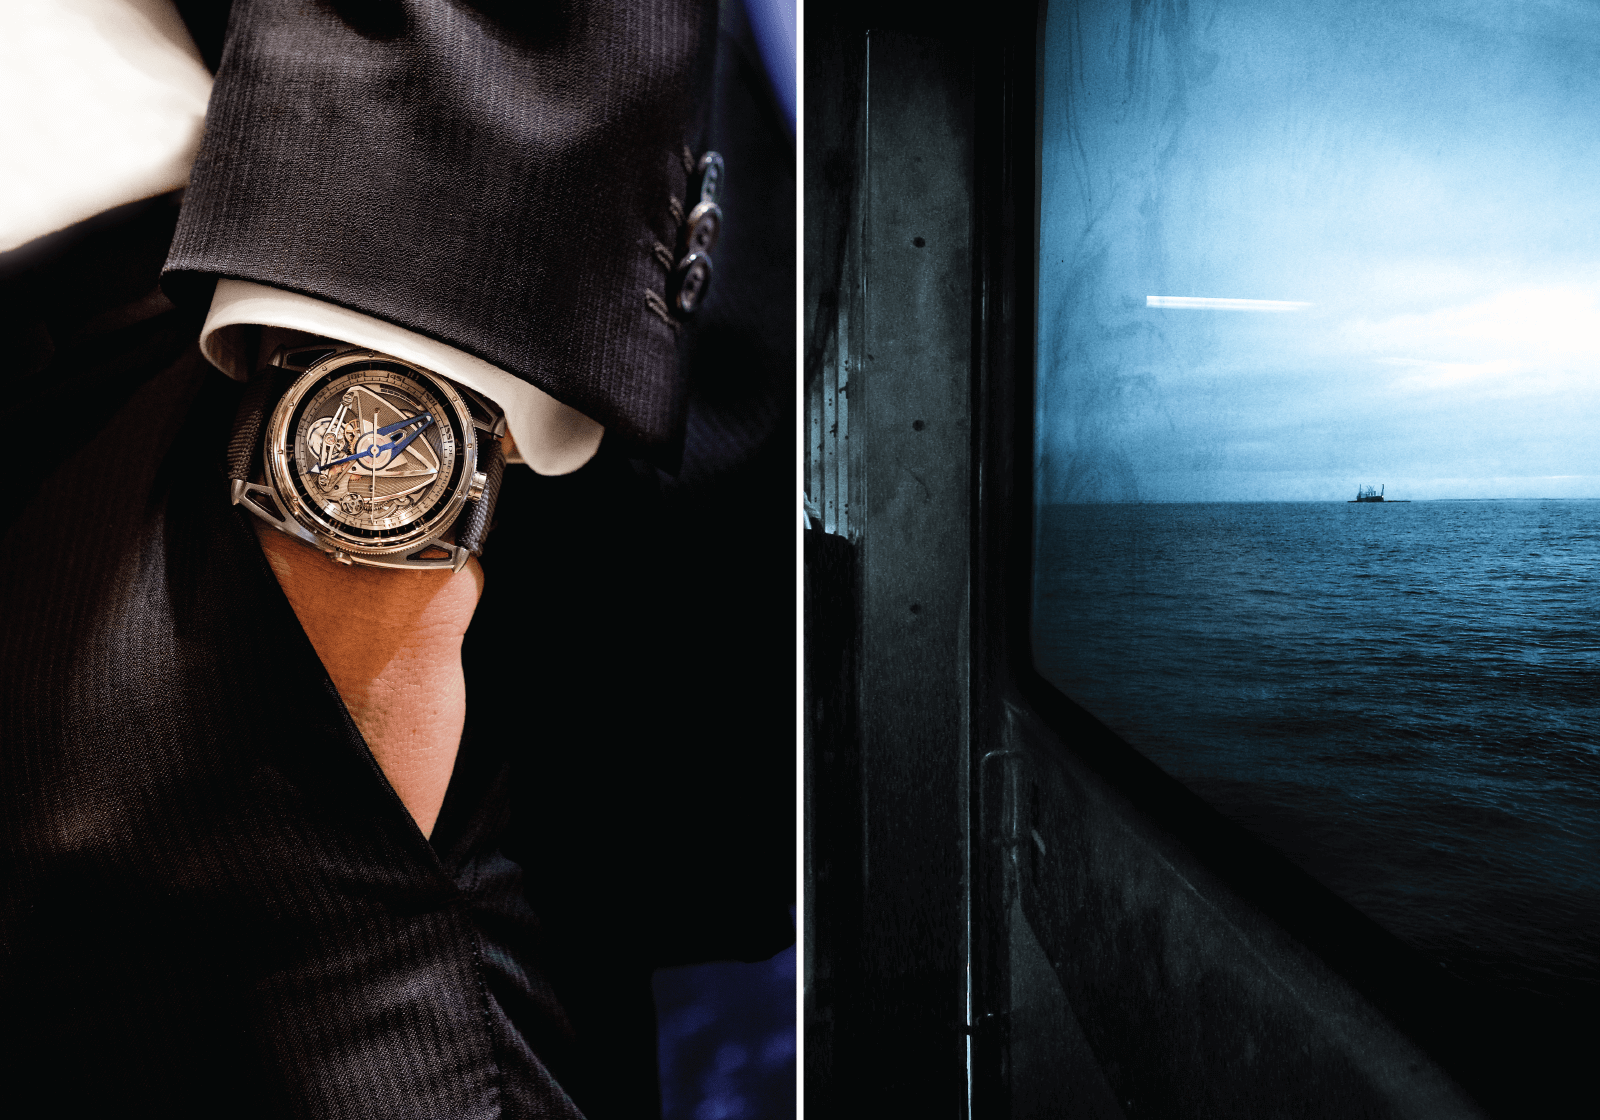 De Bethune | DB28 G GS Grand Bleu | Ref. DB28GSV 2AN Corda manual | Titânio | Ø 44 mm | Relógio cedido por De Bethune © Paulo Pires / Espiral do Tempo